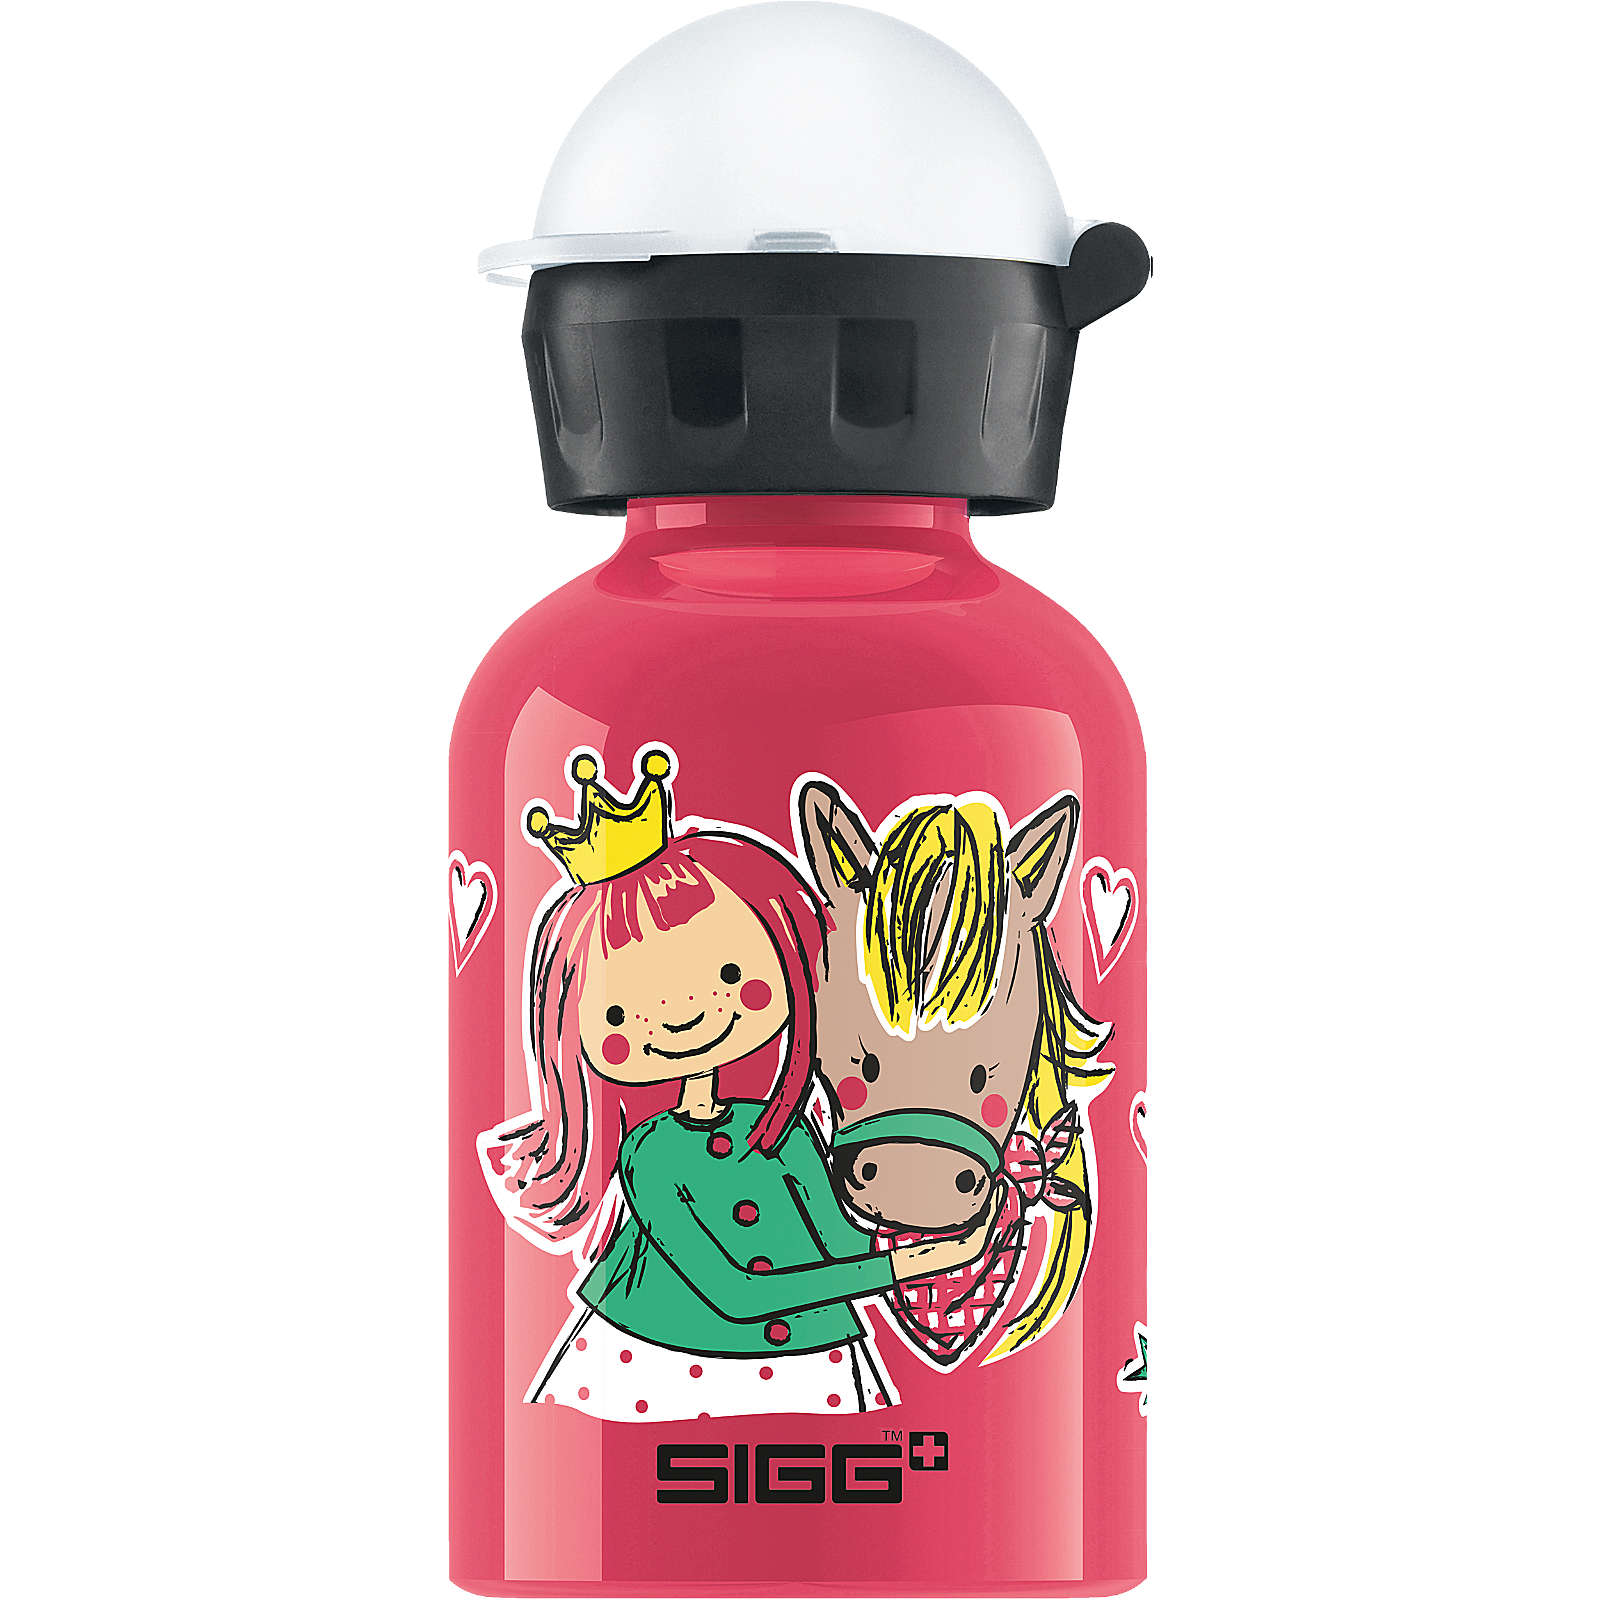 SIGG Alu-Trinkflasche My Lovely Pony, 300 ml pink Mädchen Gr. 300